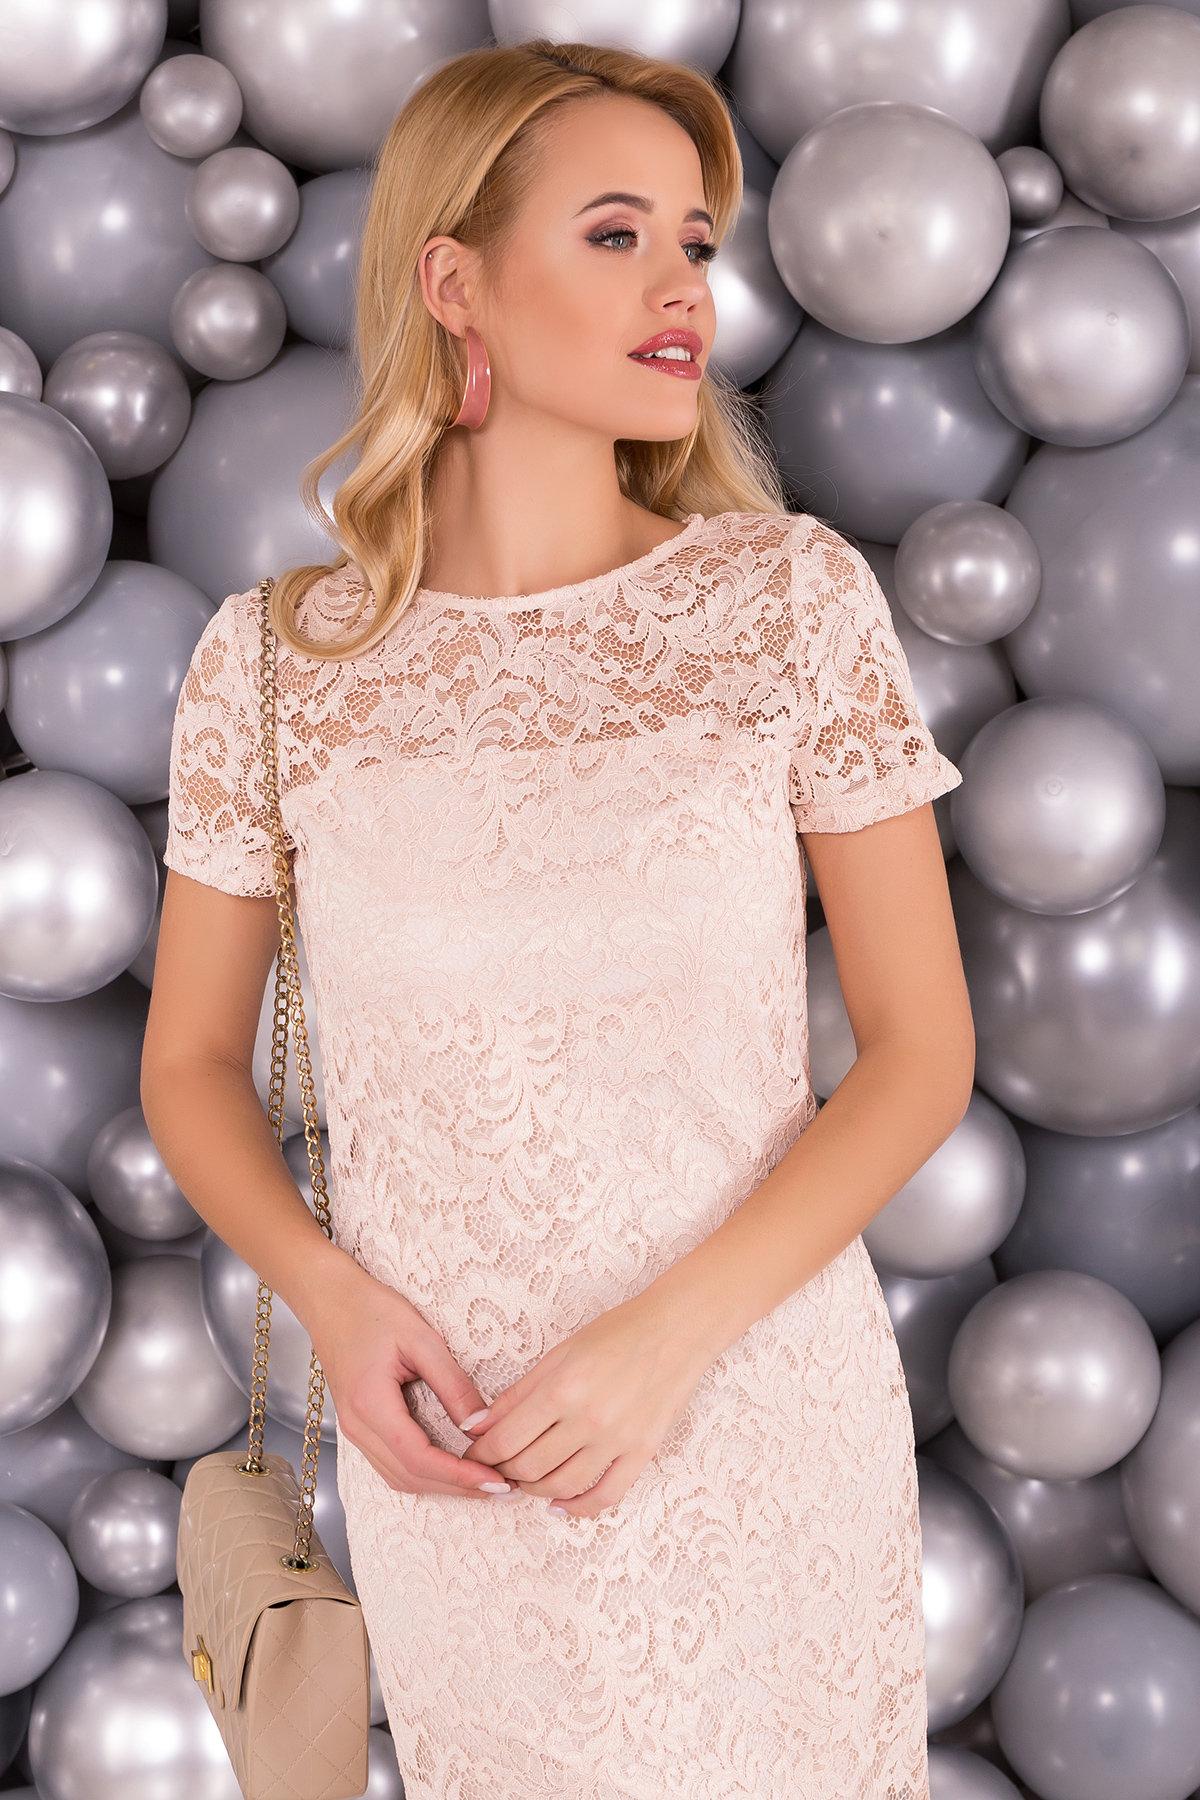 Платье Винтаж 3107 АРТ. 34278 Цвет: Бежевый - фото 3, интернет магазин tm-modus.ru